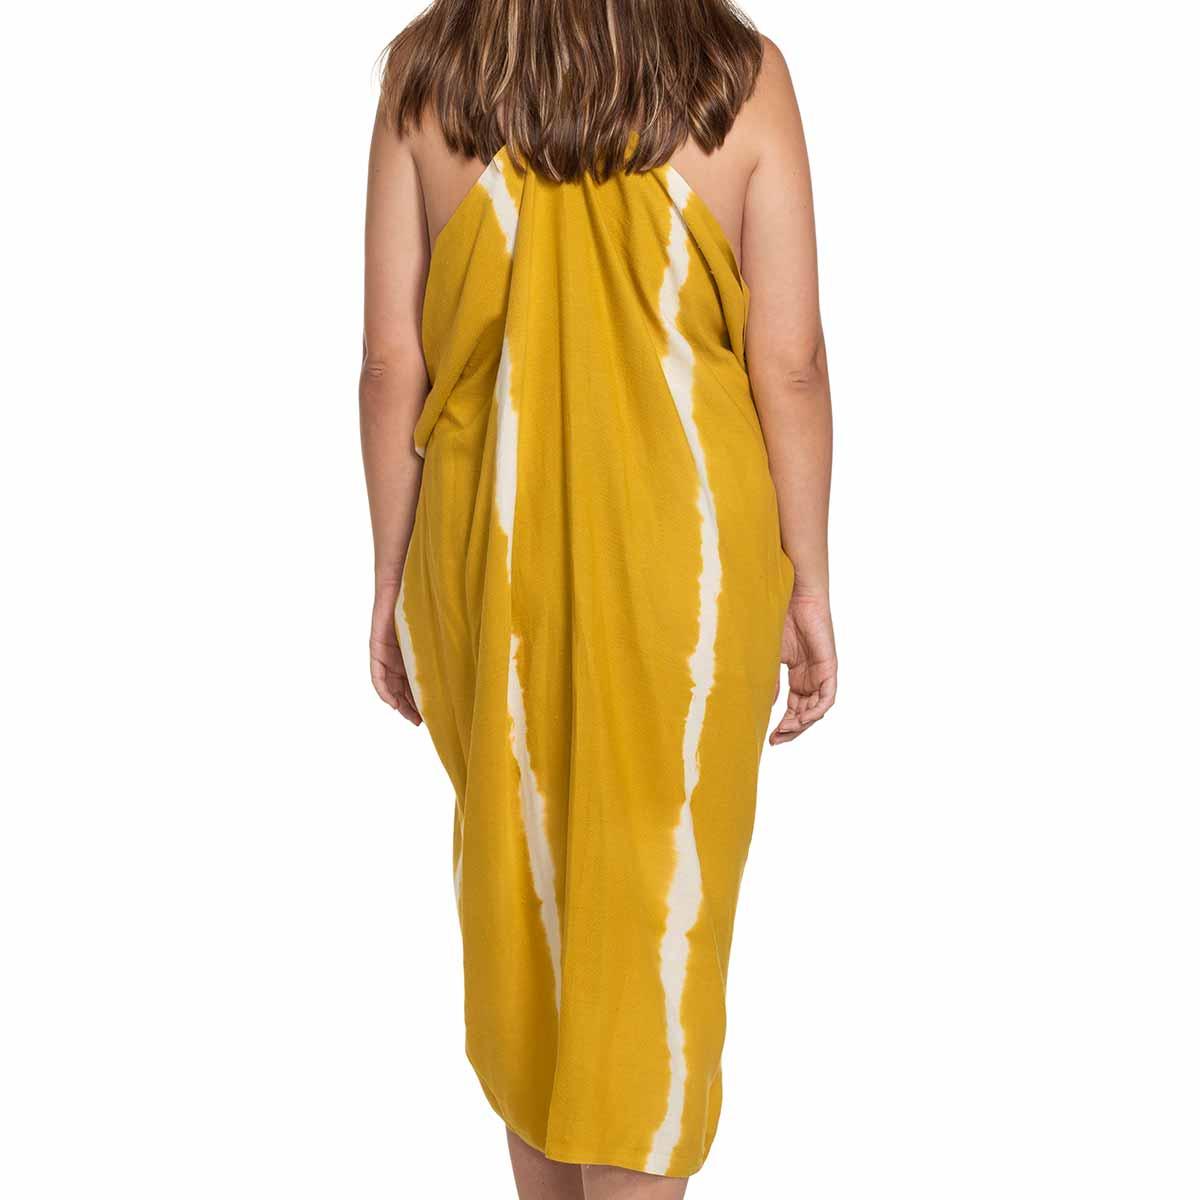 Pareo - Tie Dye / Yellow